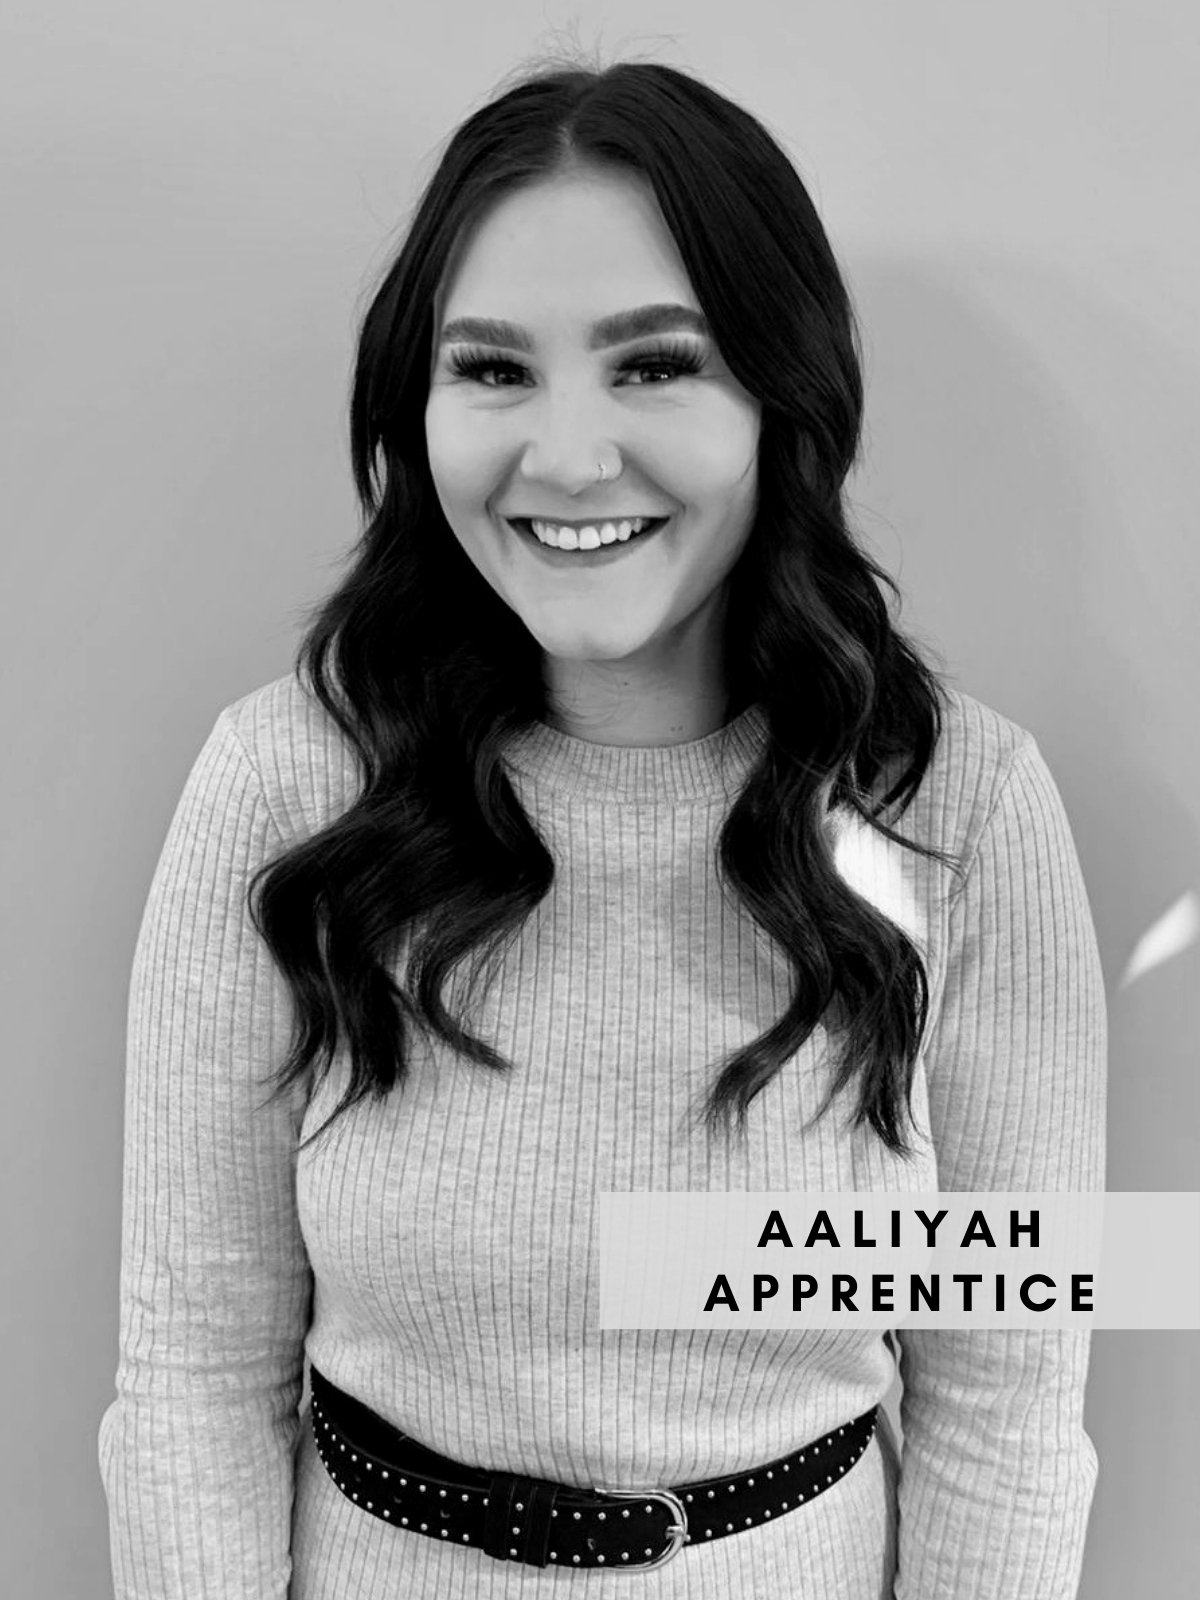 Aaliyah – Apprentice